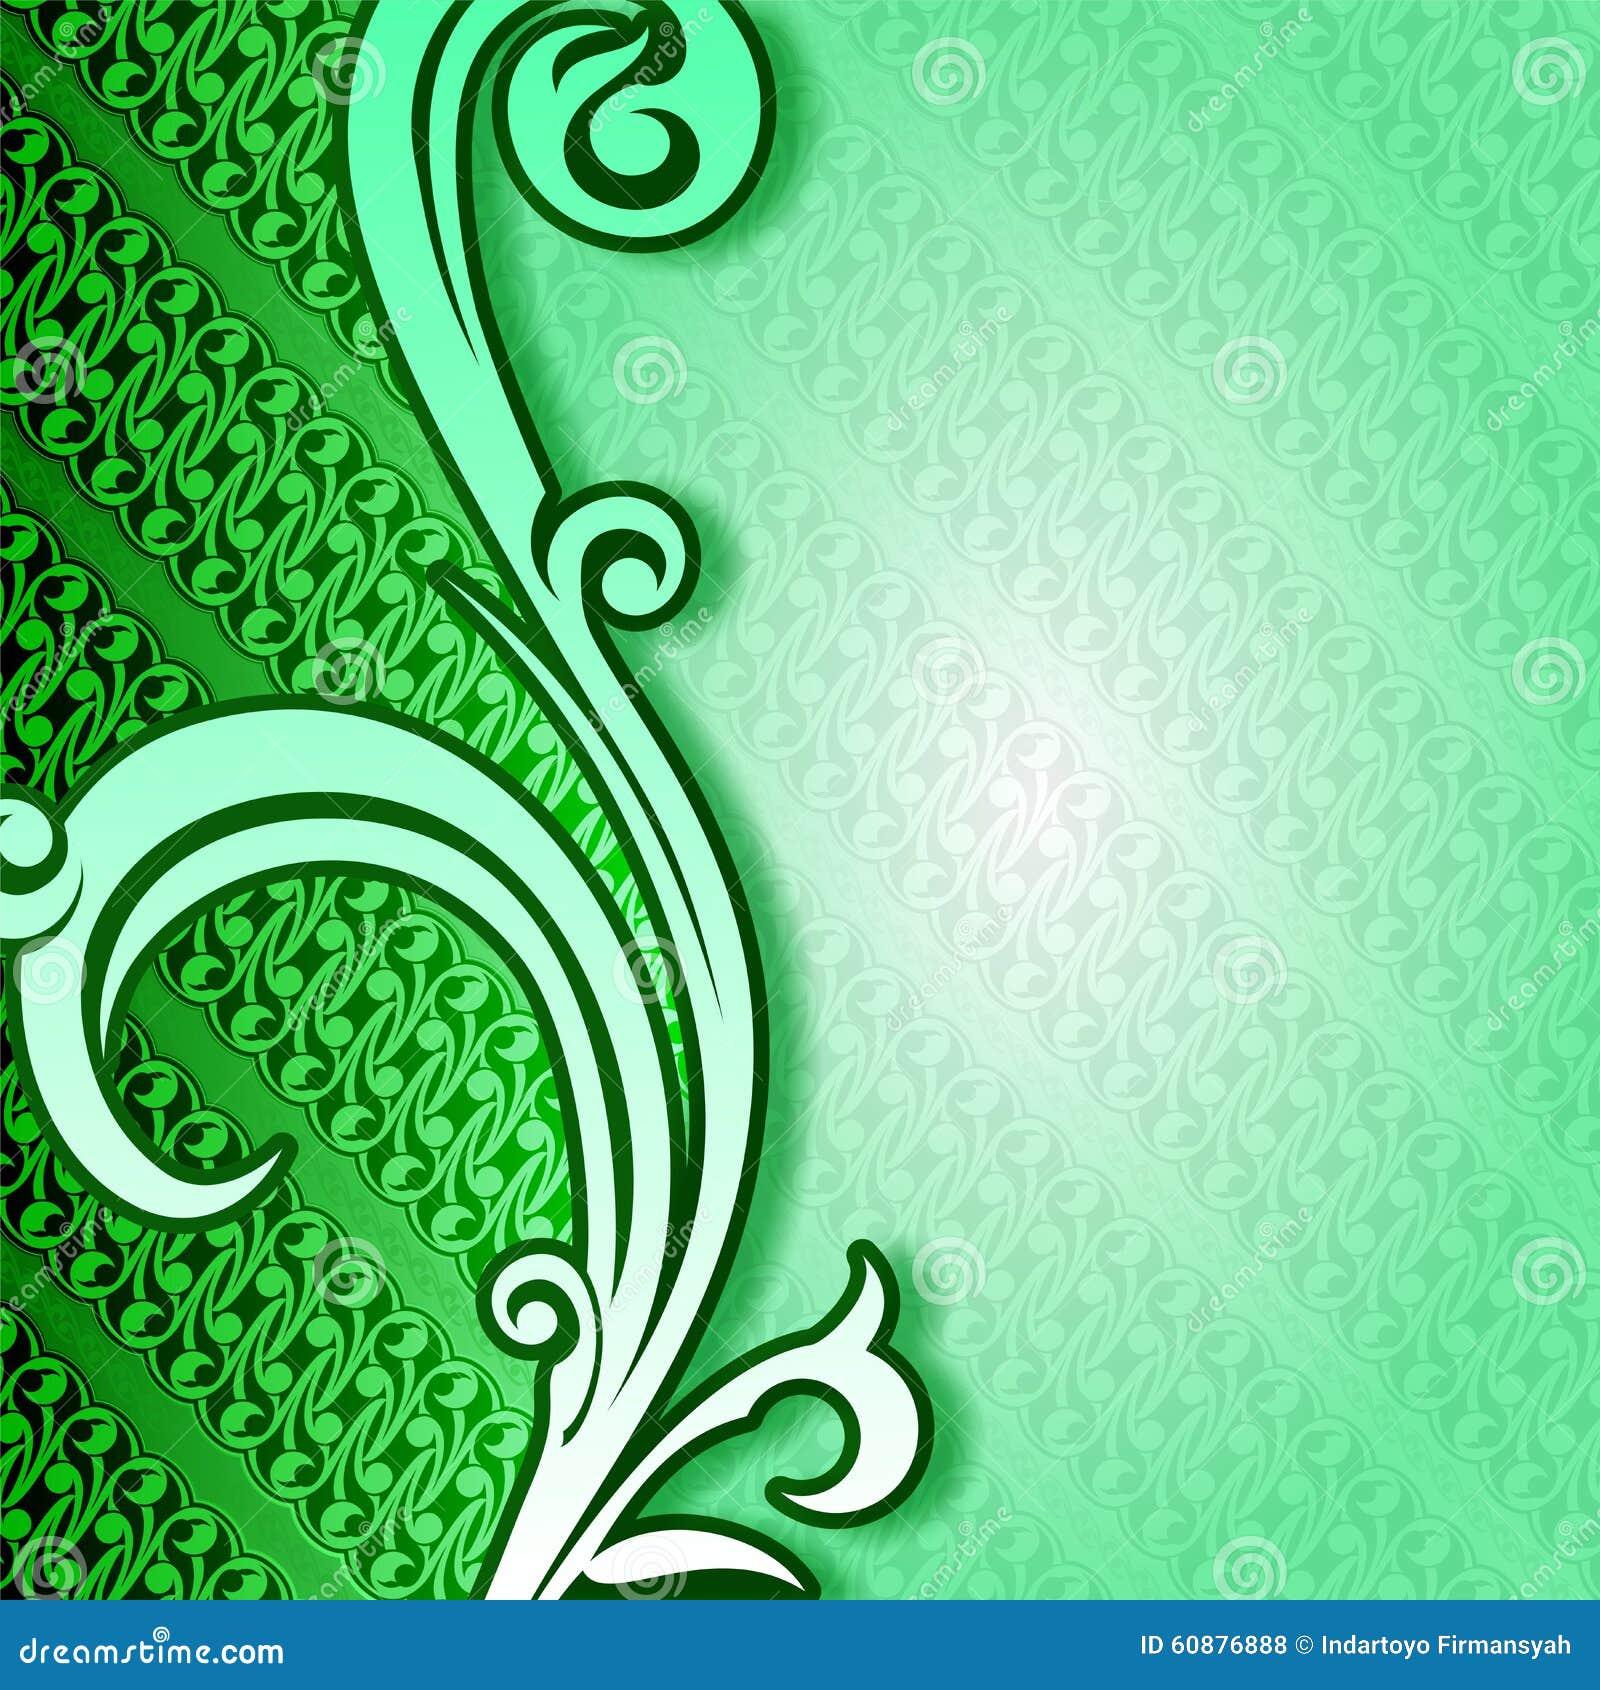 Background Kuning Batik - Nice Blog